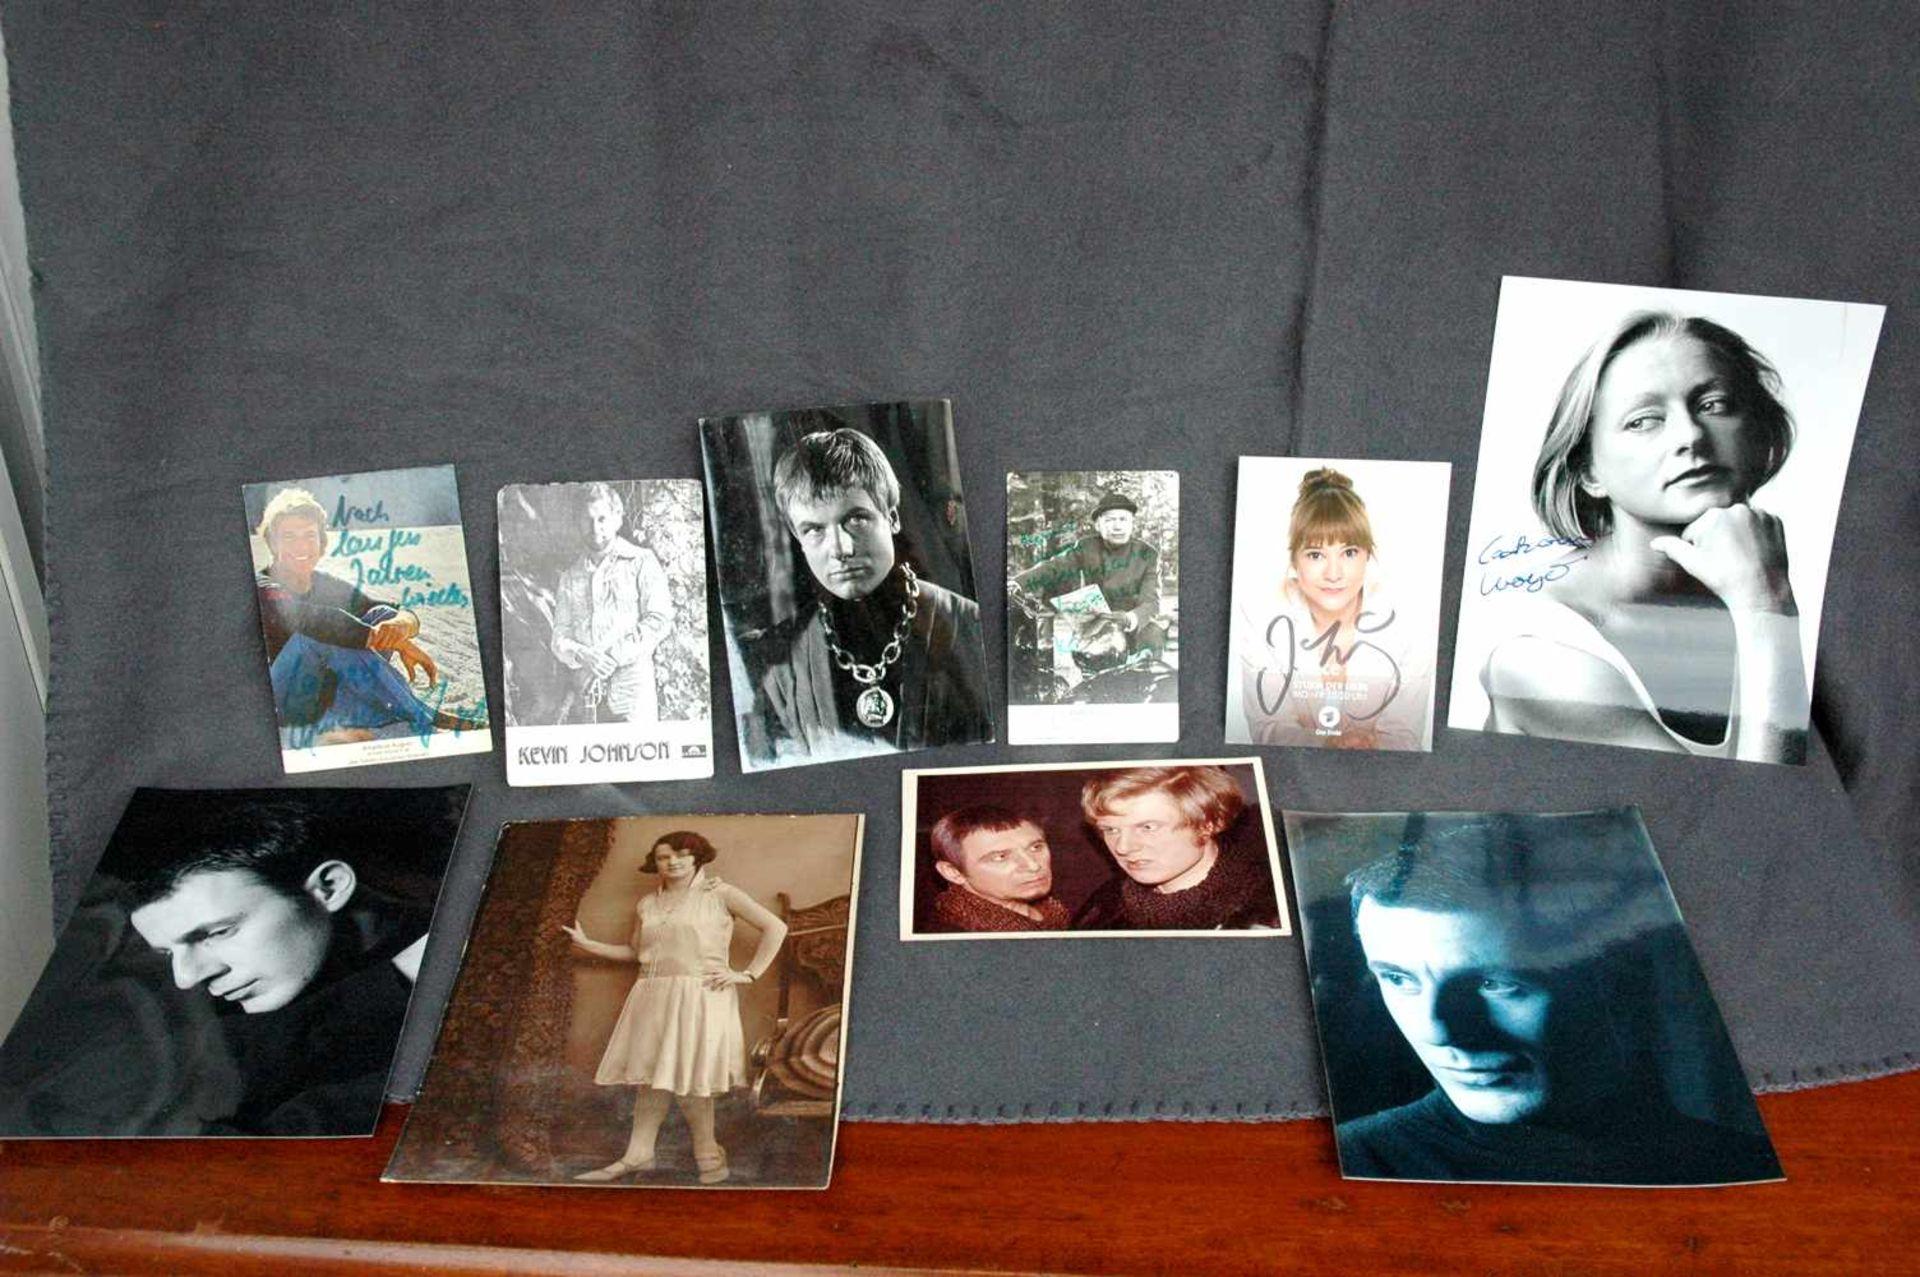 7 Autogramm-Karten: Kevin Johnson, Amadeus August, 2x ?, Wolfgang Völz, Catharine Weyer (?), Julia